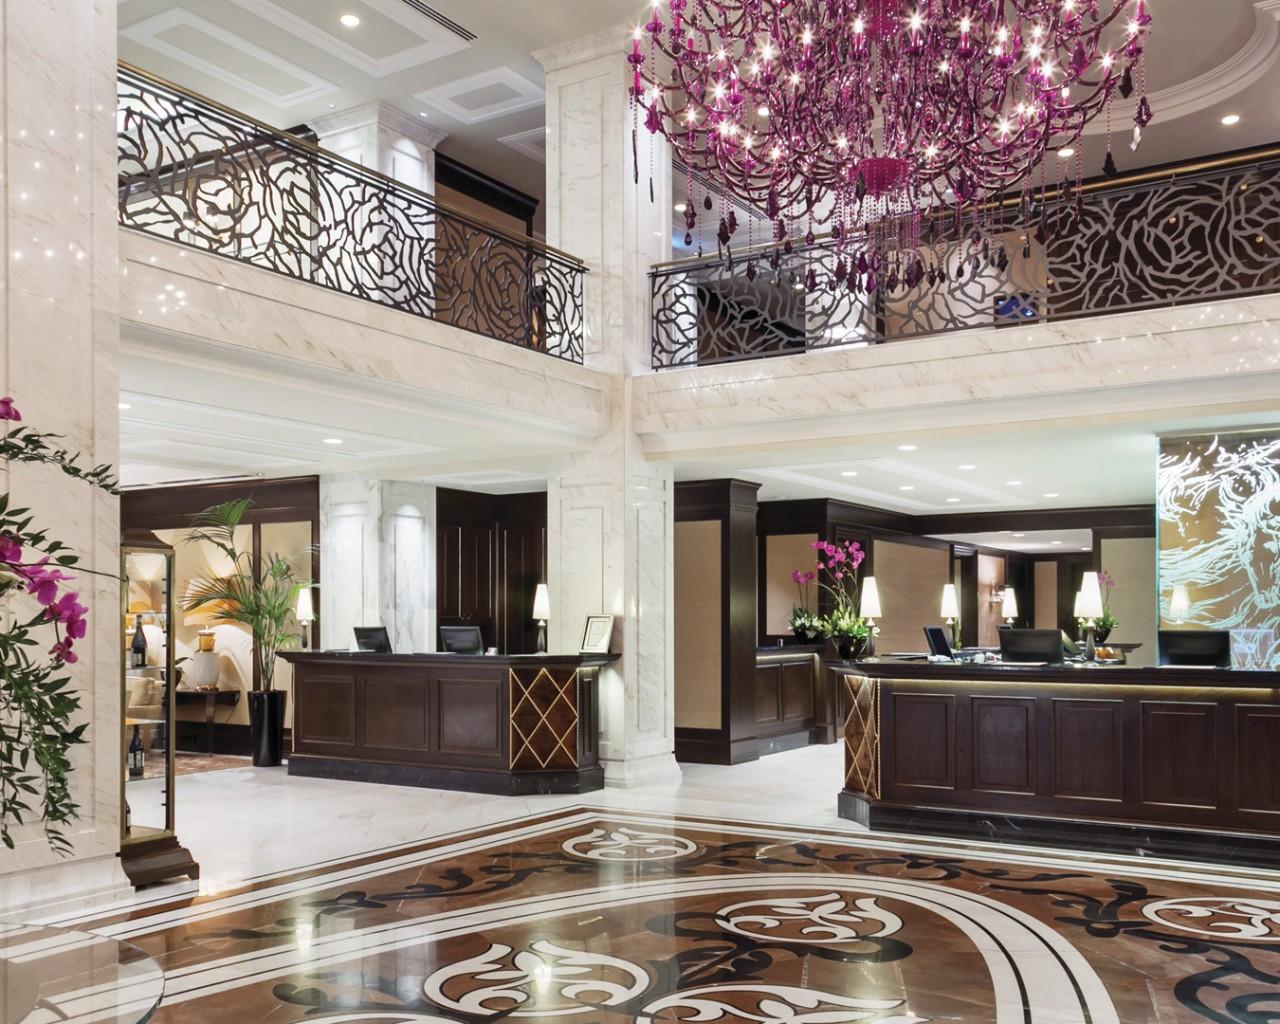 Reception at Hotel Baltschug Kempinski Moscow